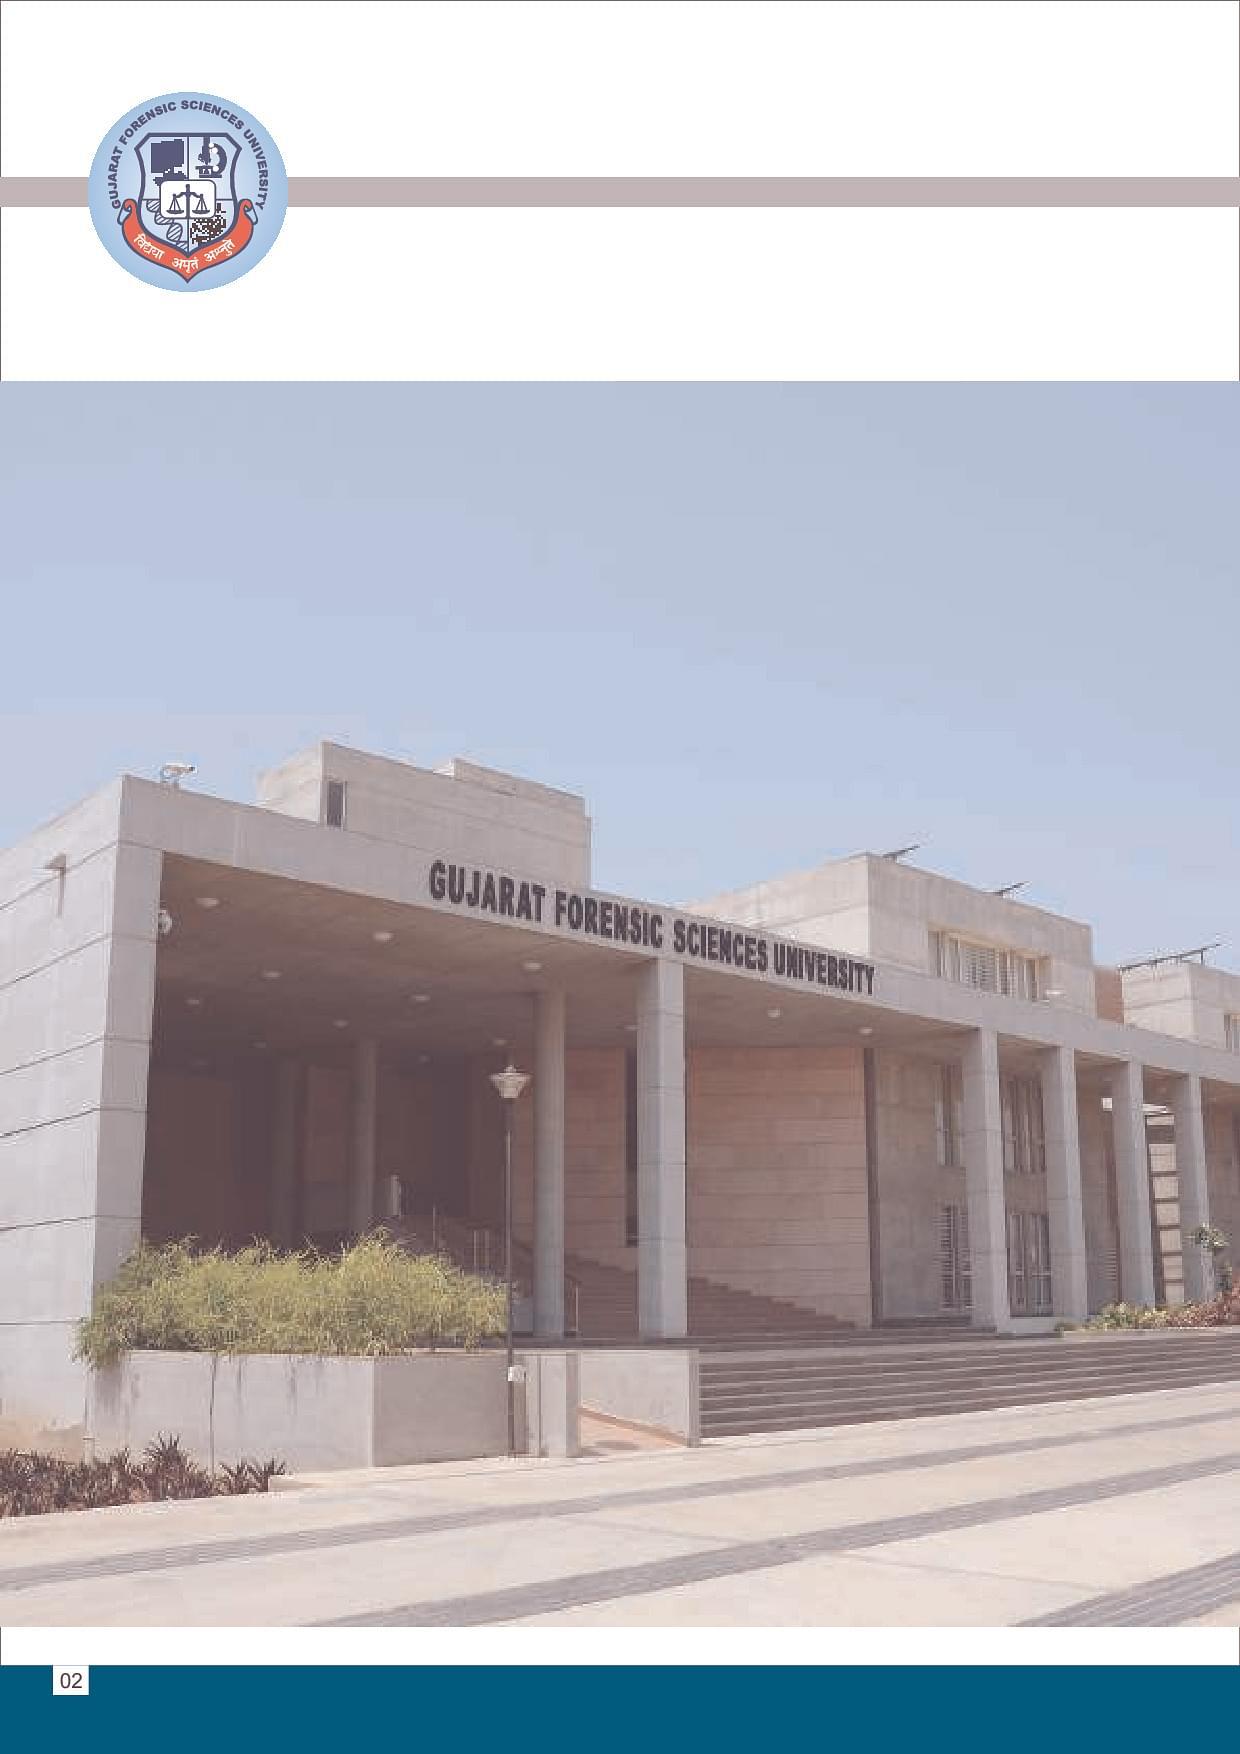 Gujarat Forensic Sciences University Gfsu Gandhi